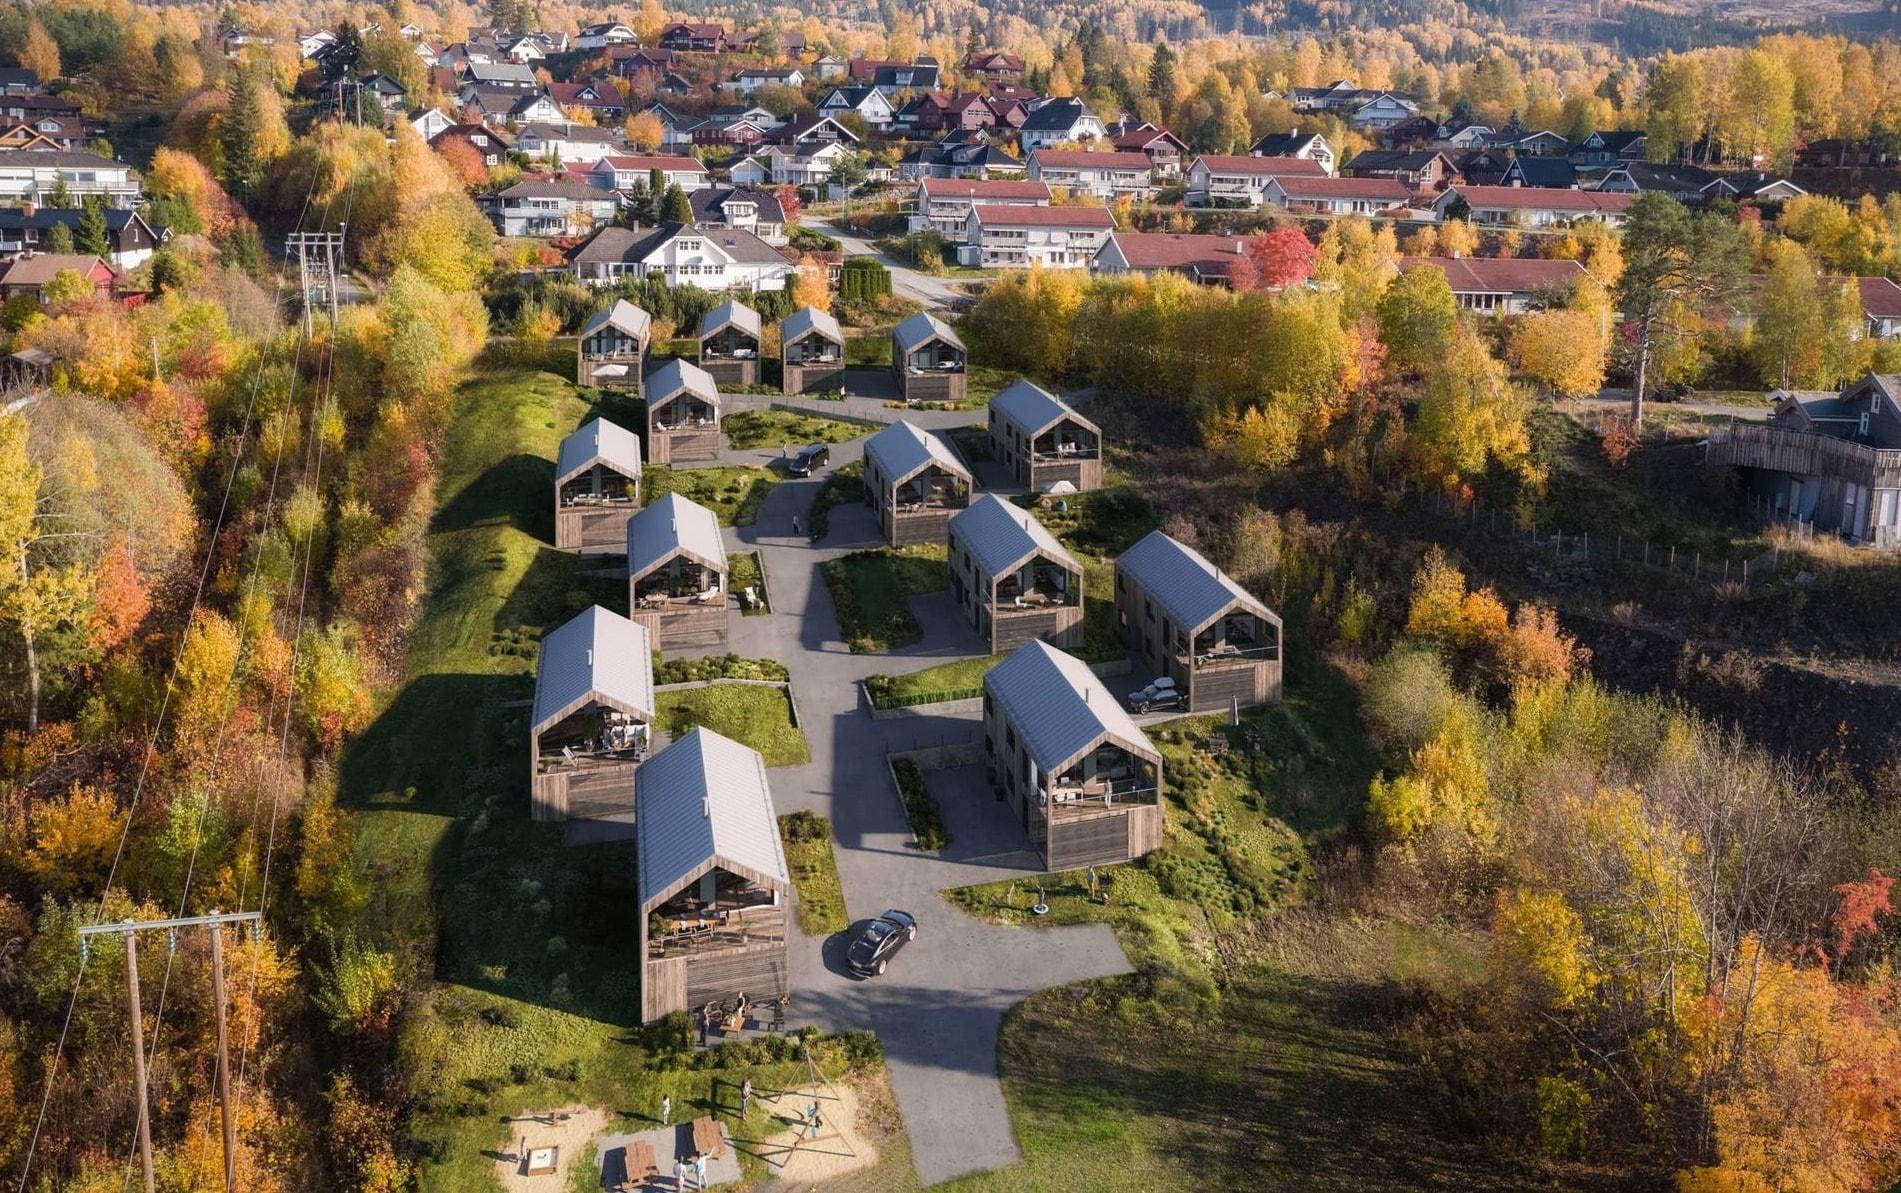 Residential area, Aerial photography, Leaf, Tree, Sky, Autumn, Suburb